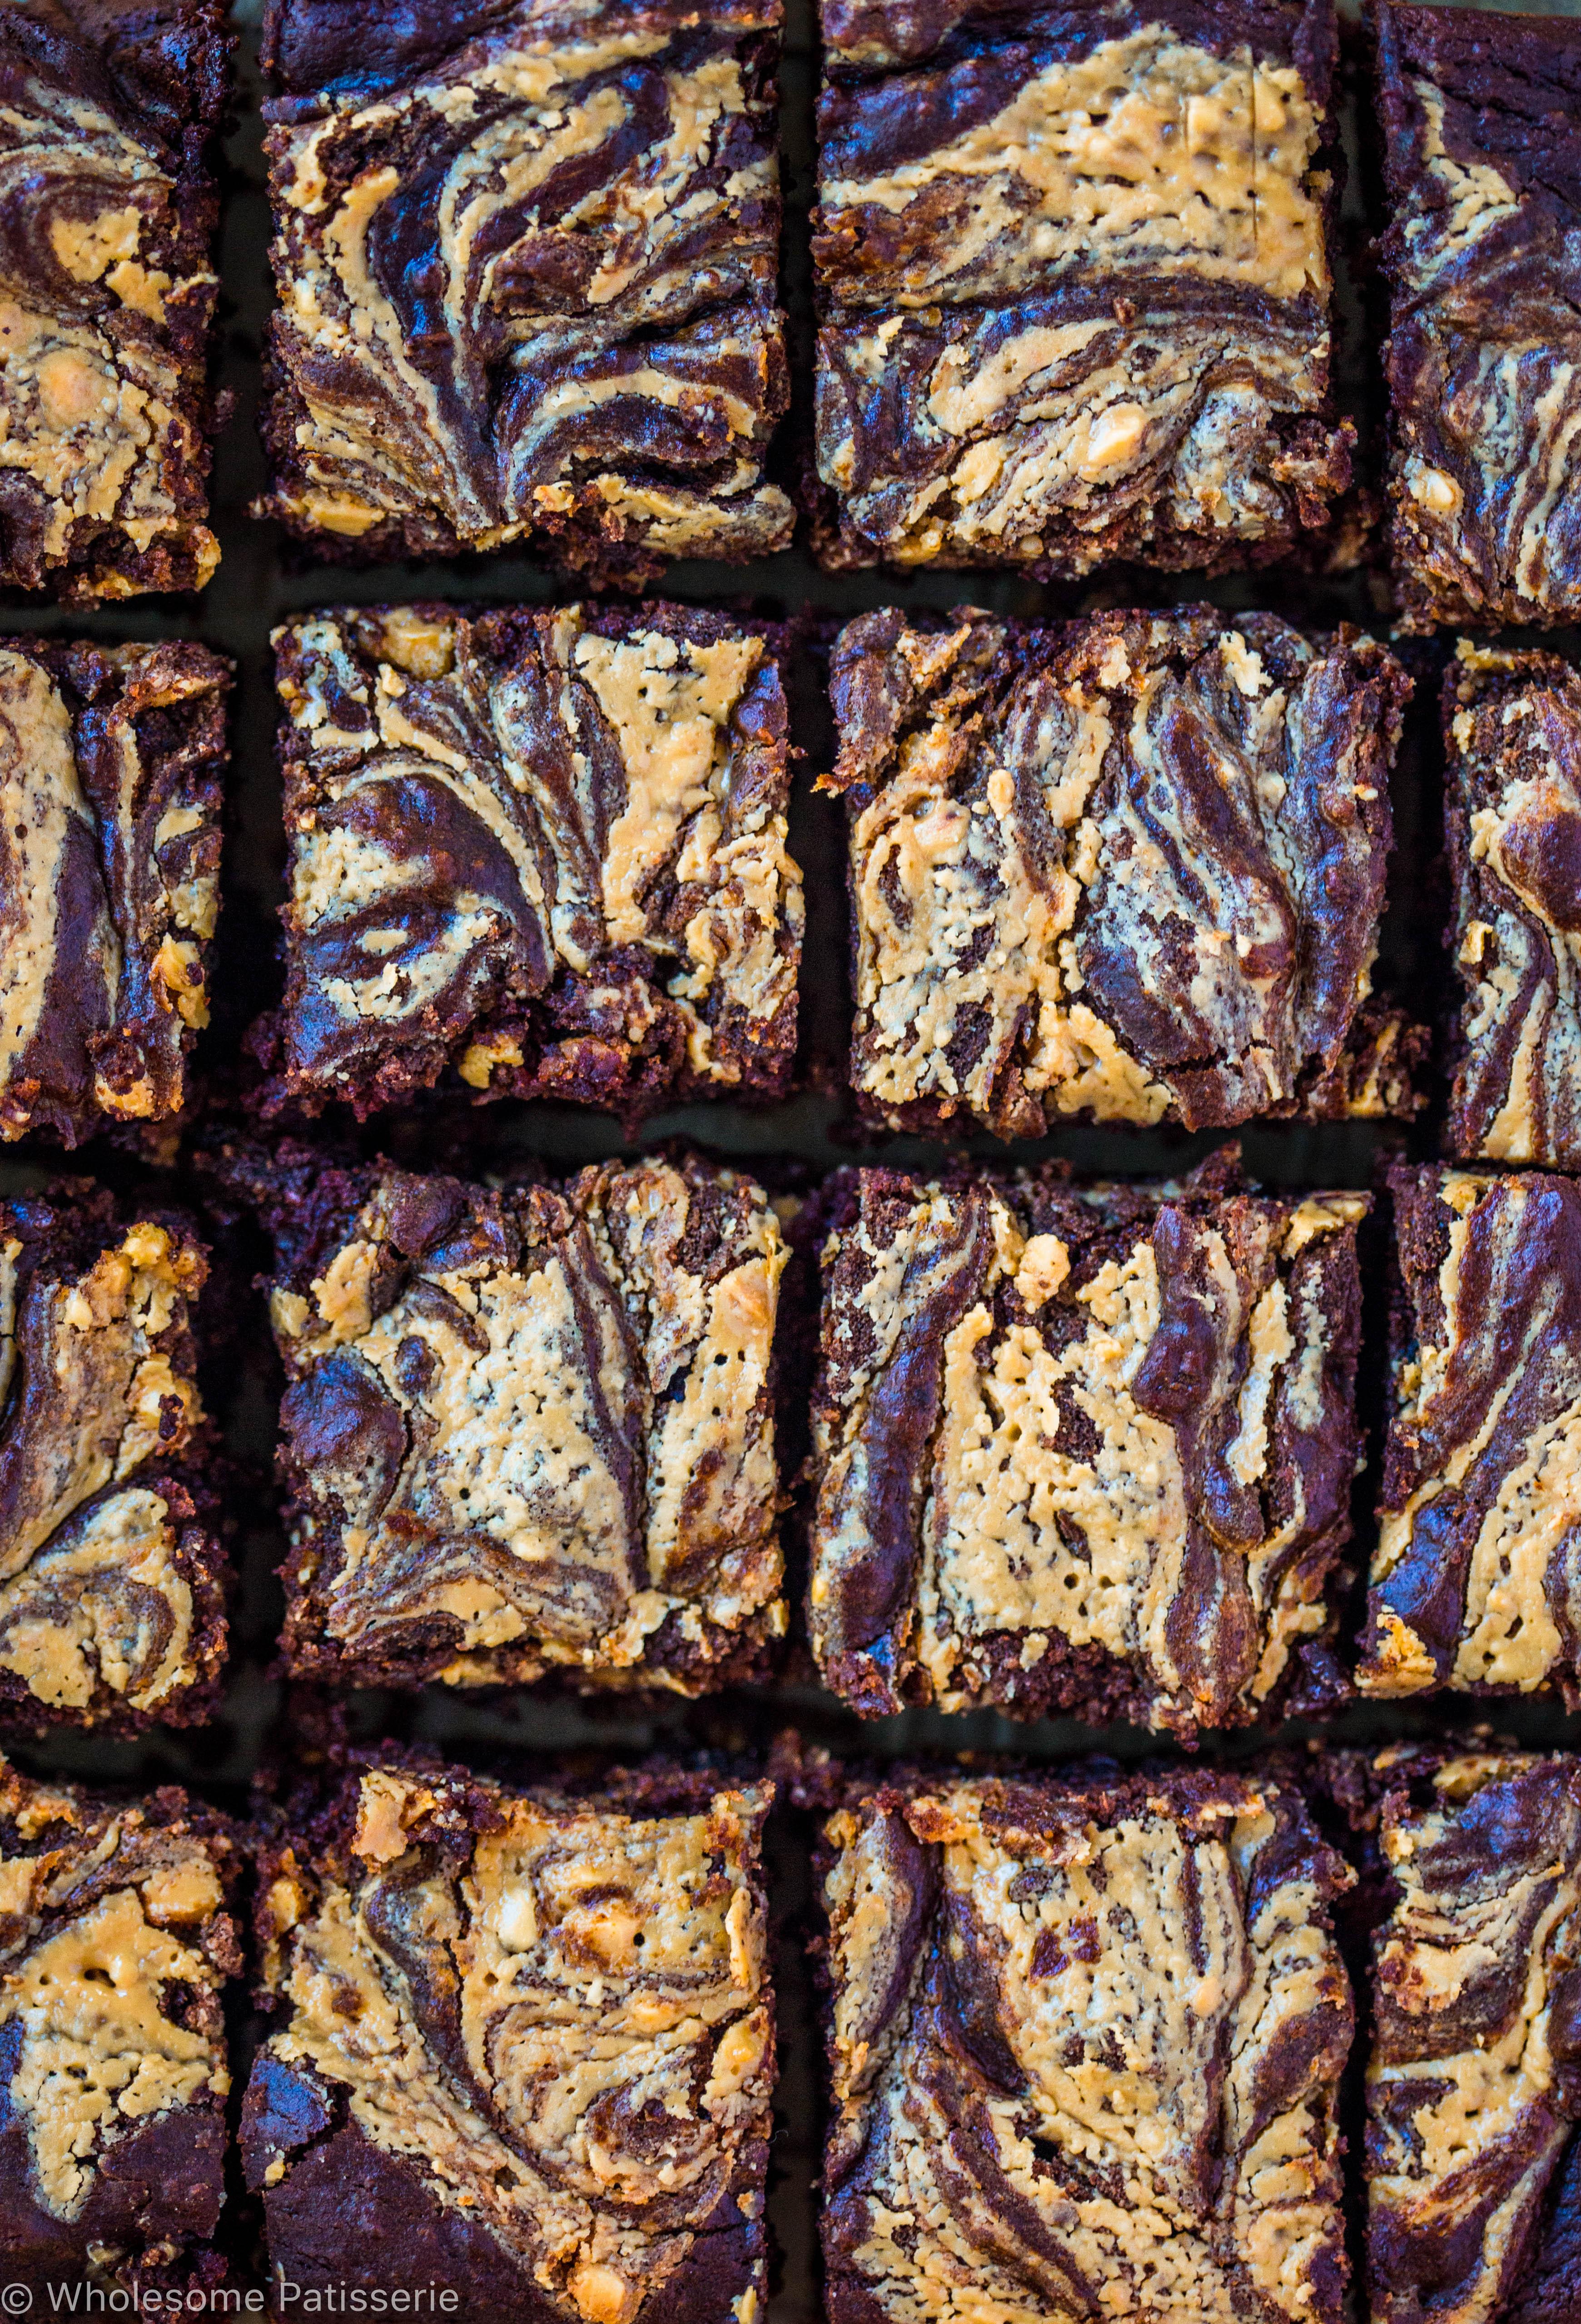 chocolate-peanut-butter-swirl-brownies-gluten-free-vegan-dairy-free-easy-delicious